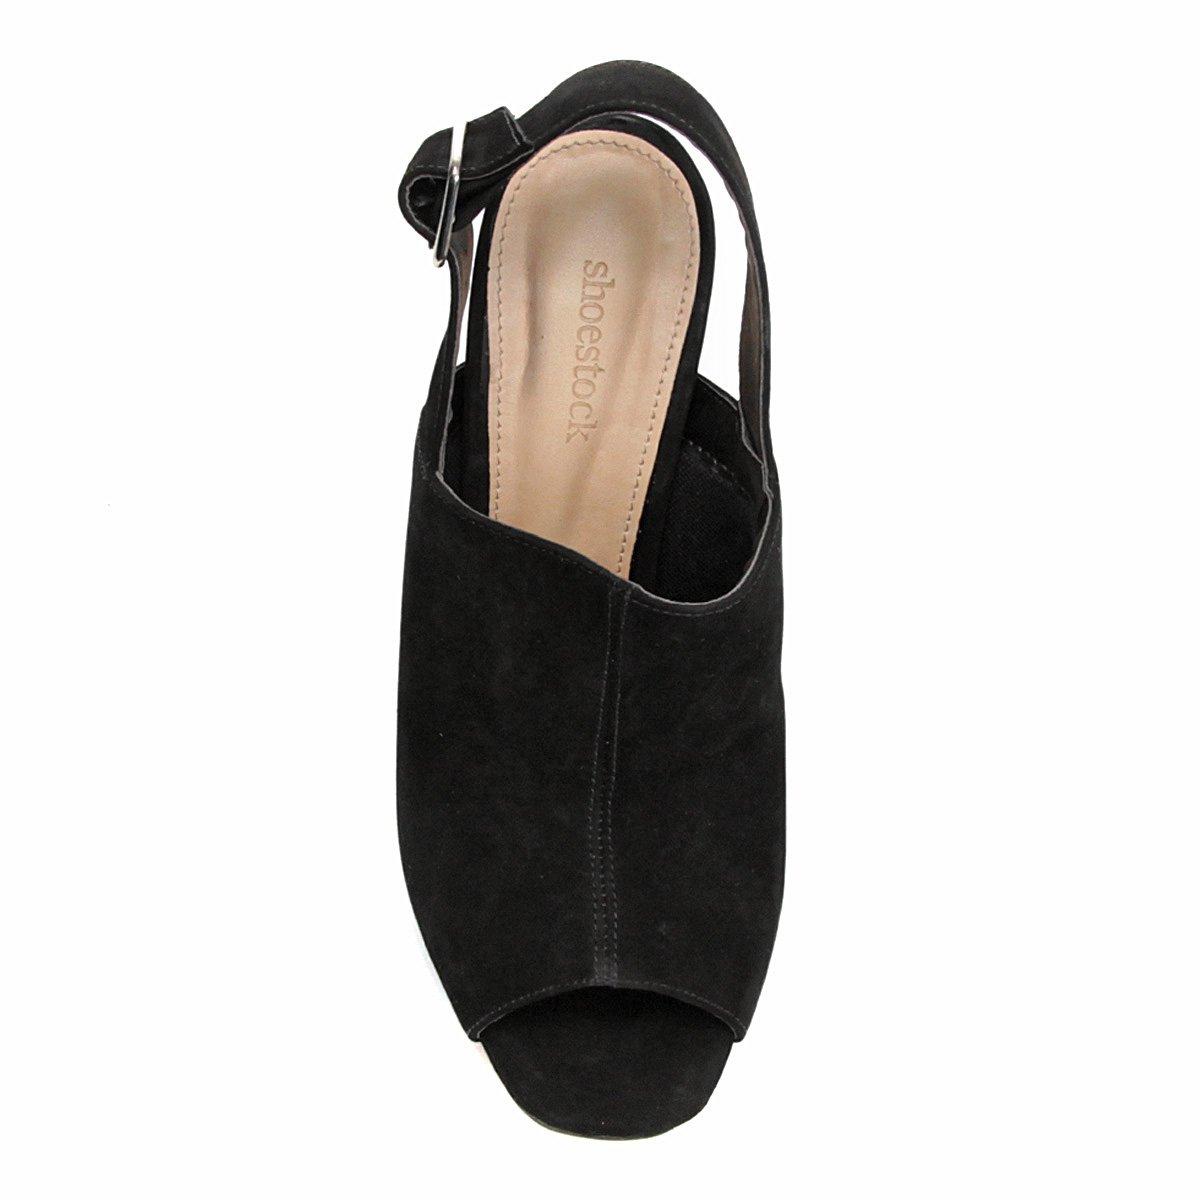 Preto Pata Shoestock Sandália Shoestock Feminina Sandália Couro Couro Preto Feminina Pata Meia Meia ZwHg6q